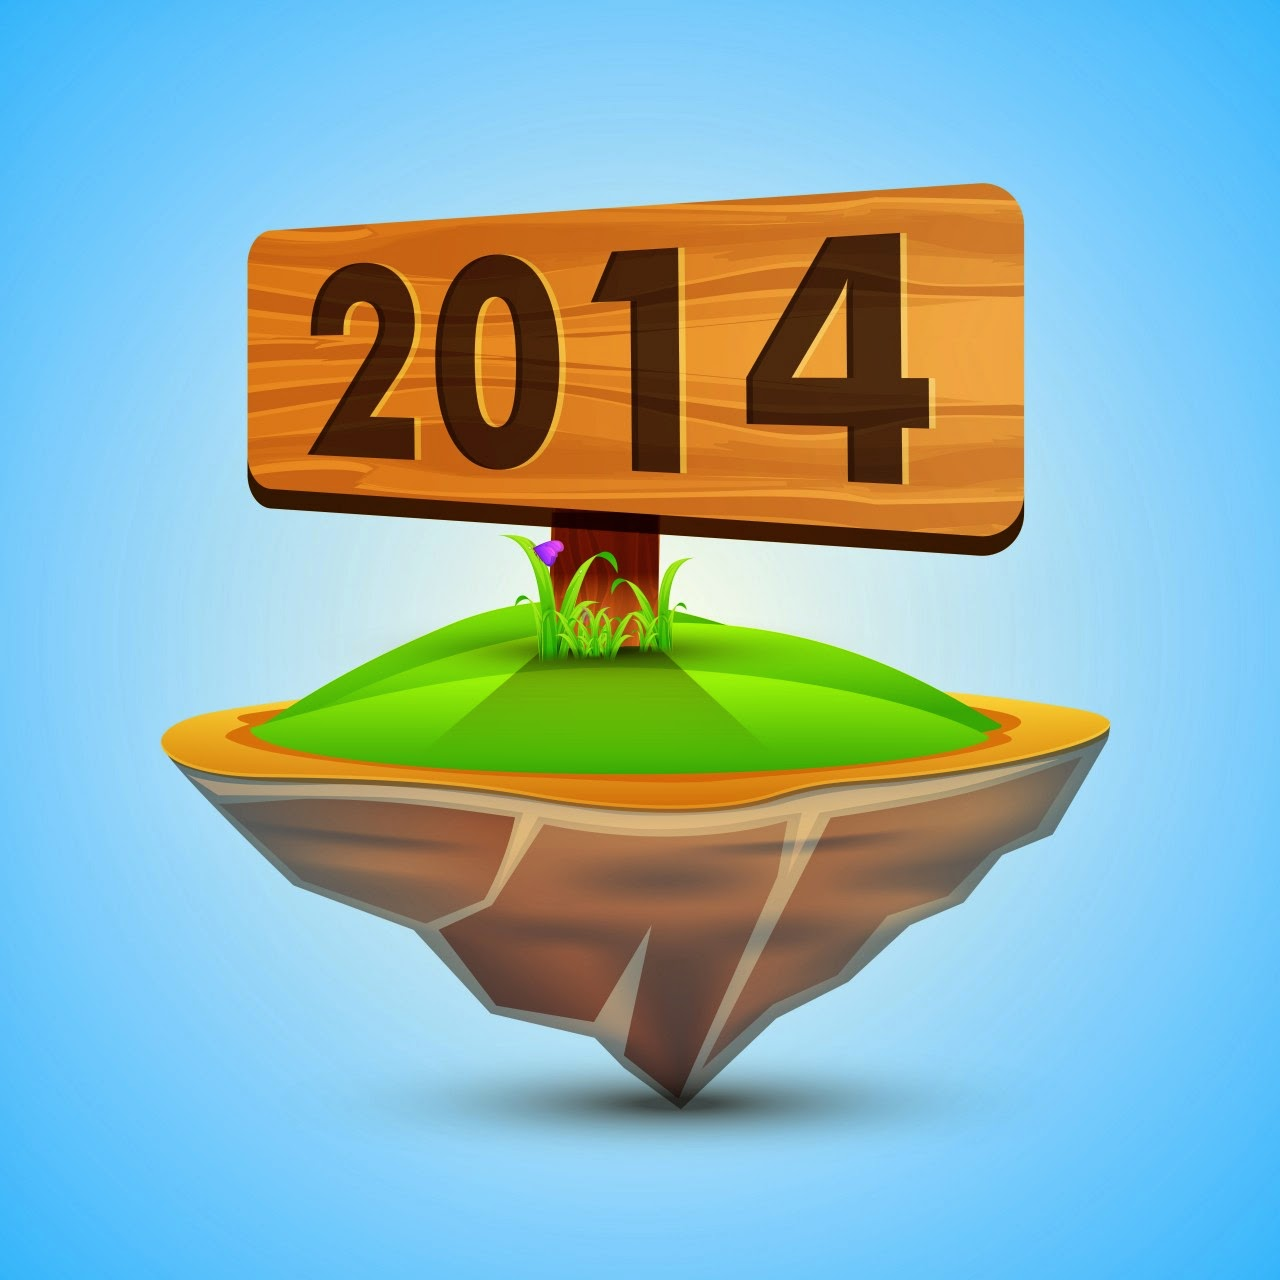 New Best Impressive Pics: Best HD Art : Celebrate Happy New Yea -2014 Impressive